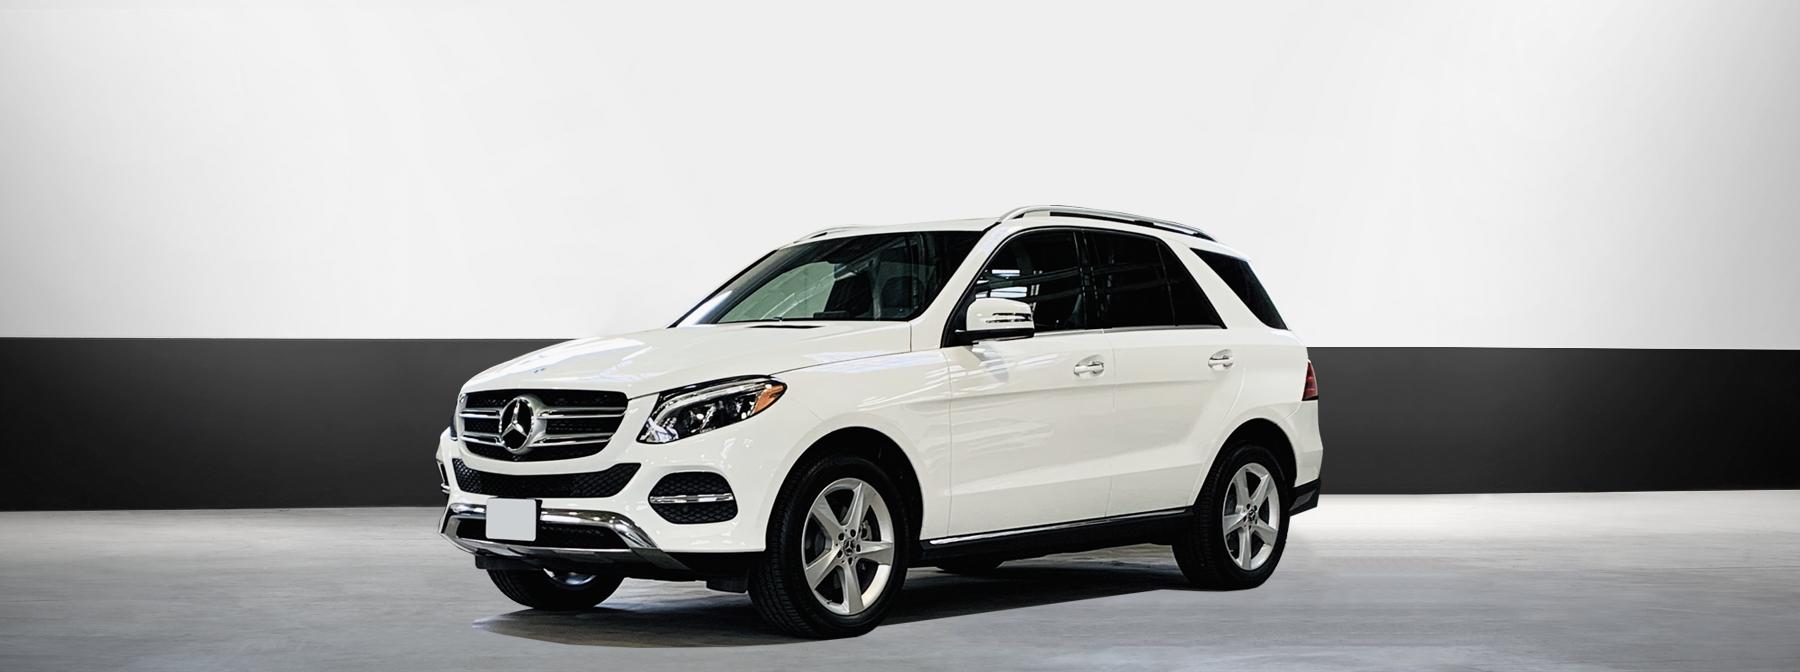 Mercedes suv rental GLE 350 in white